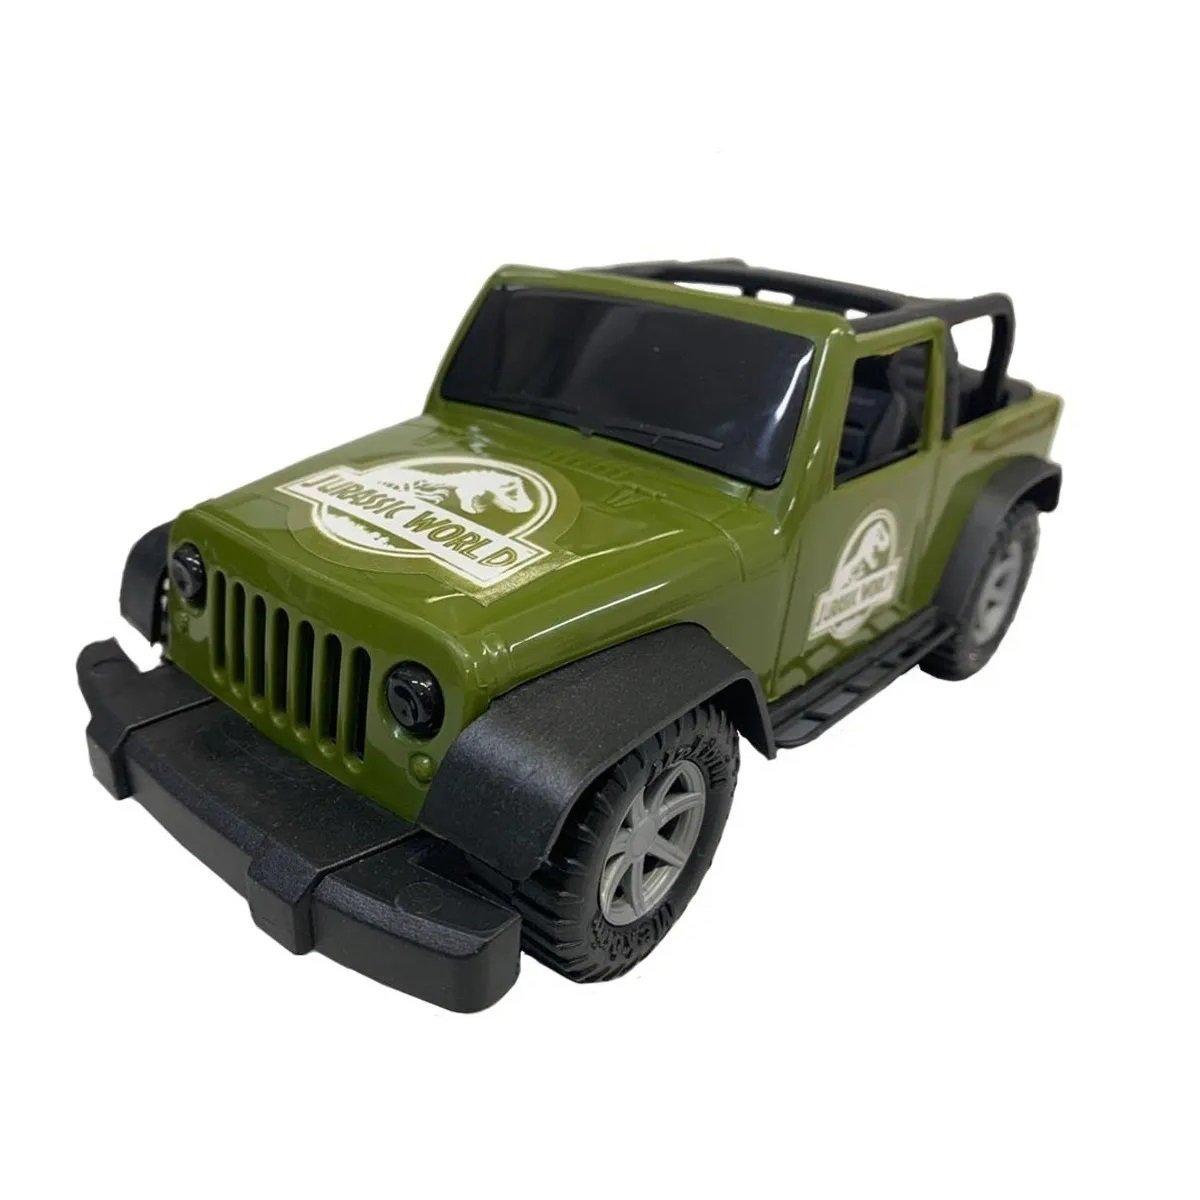 Carrinho Jeep Jurassic World Veículo De Aventura Pupee 4003